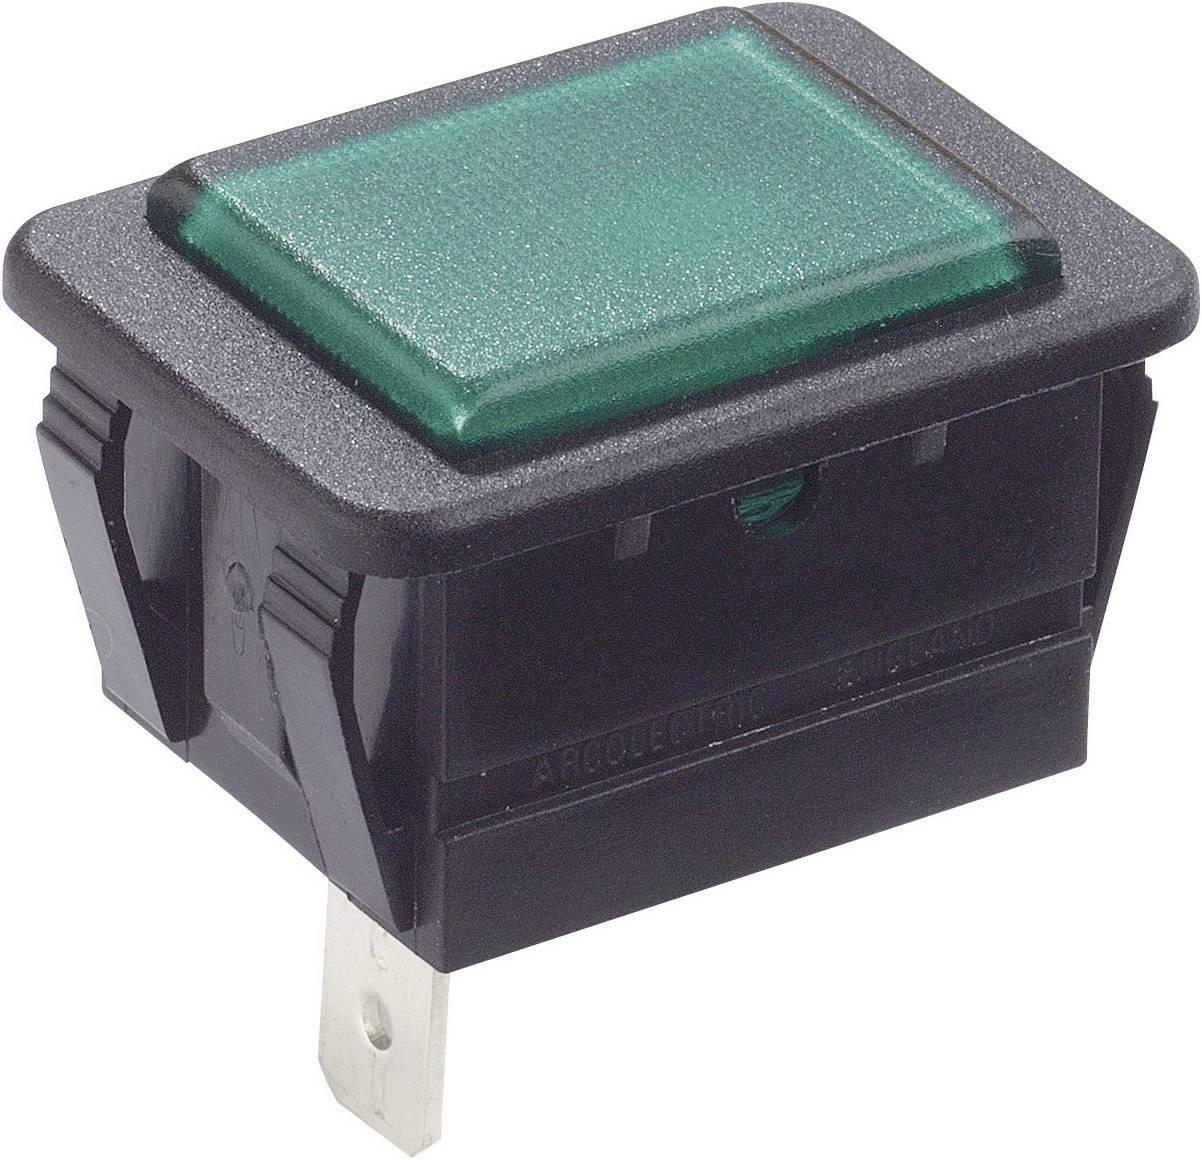 Signalizačné svetlá Arcolectric C0480ABNAC, zelená, čierna, 1 ks